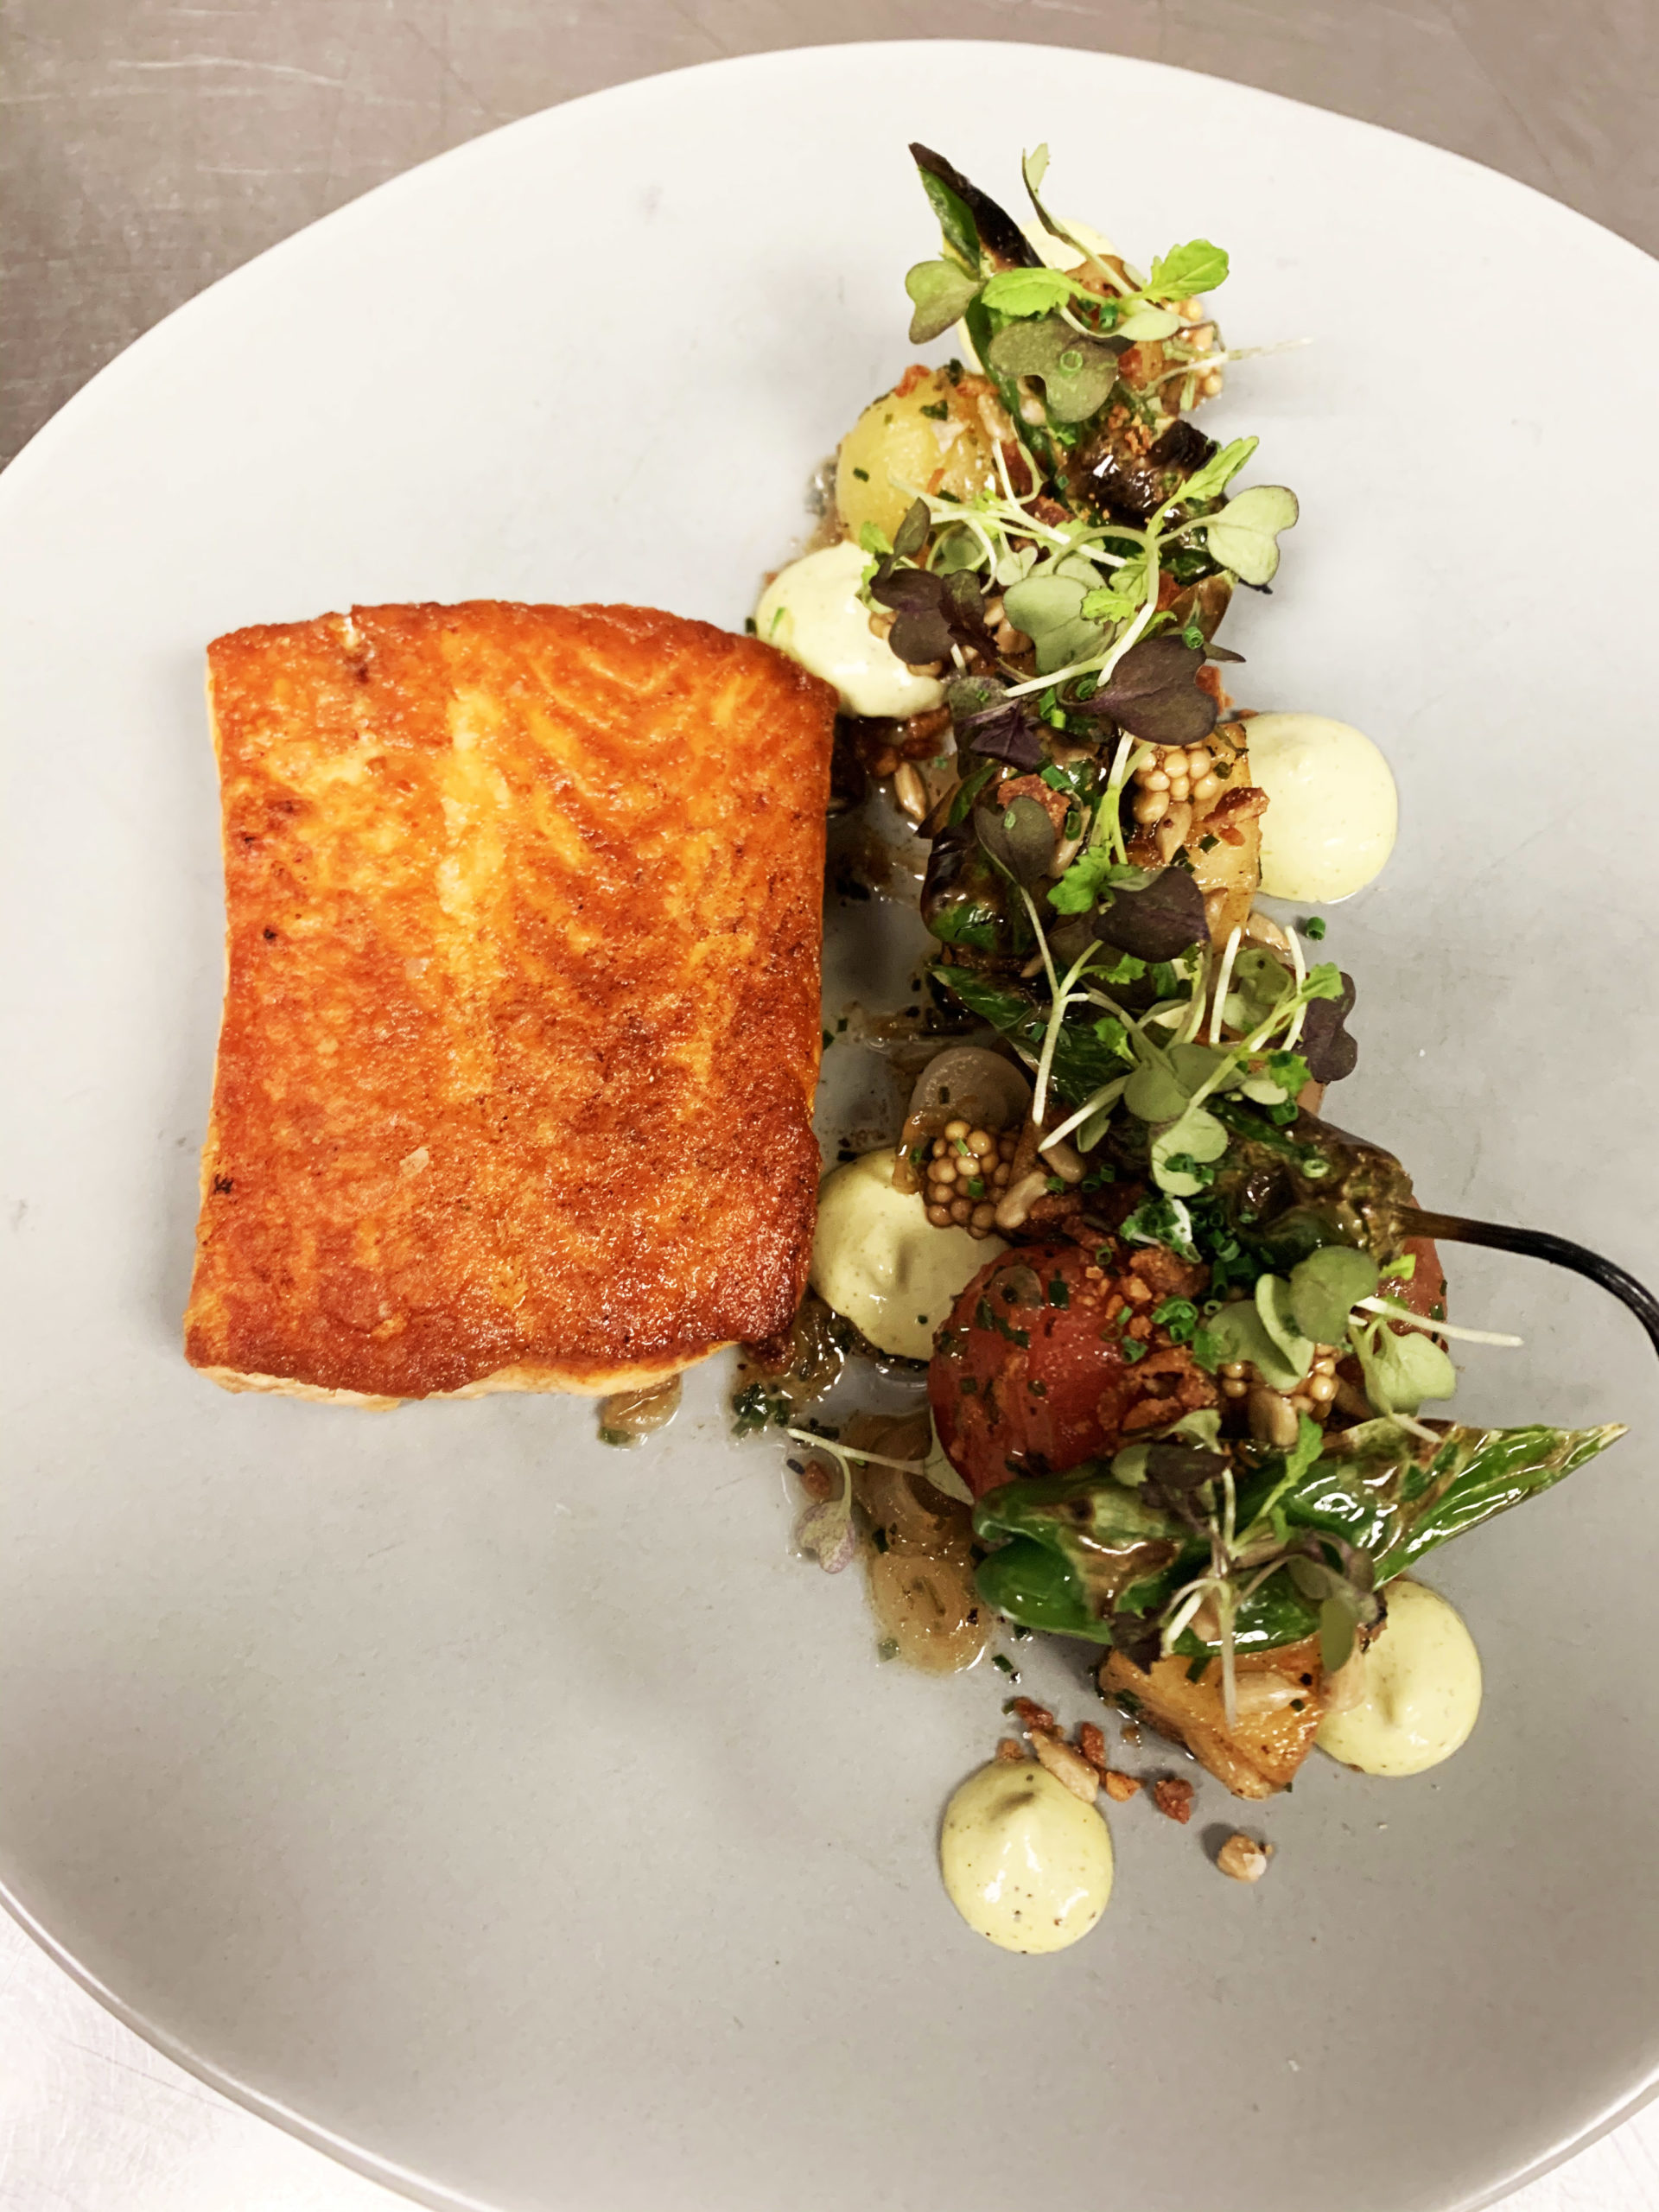 Celebrating Food Day Canada: Pan Roasted BC Raised Atlantic Salmon